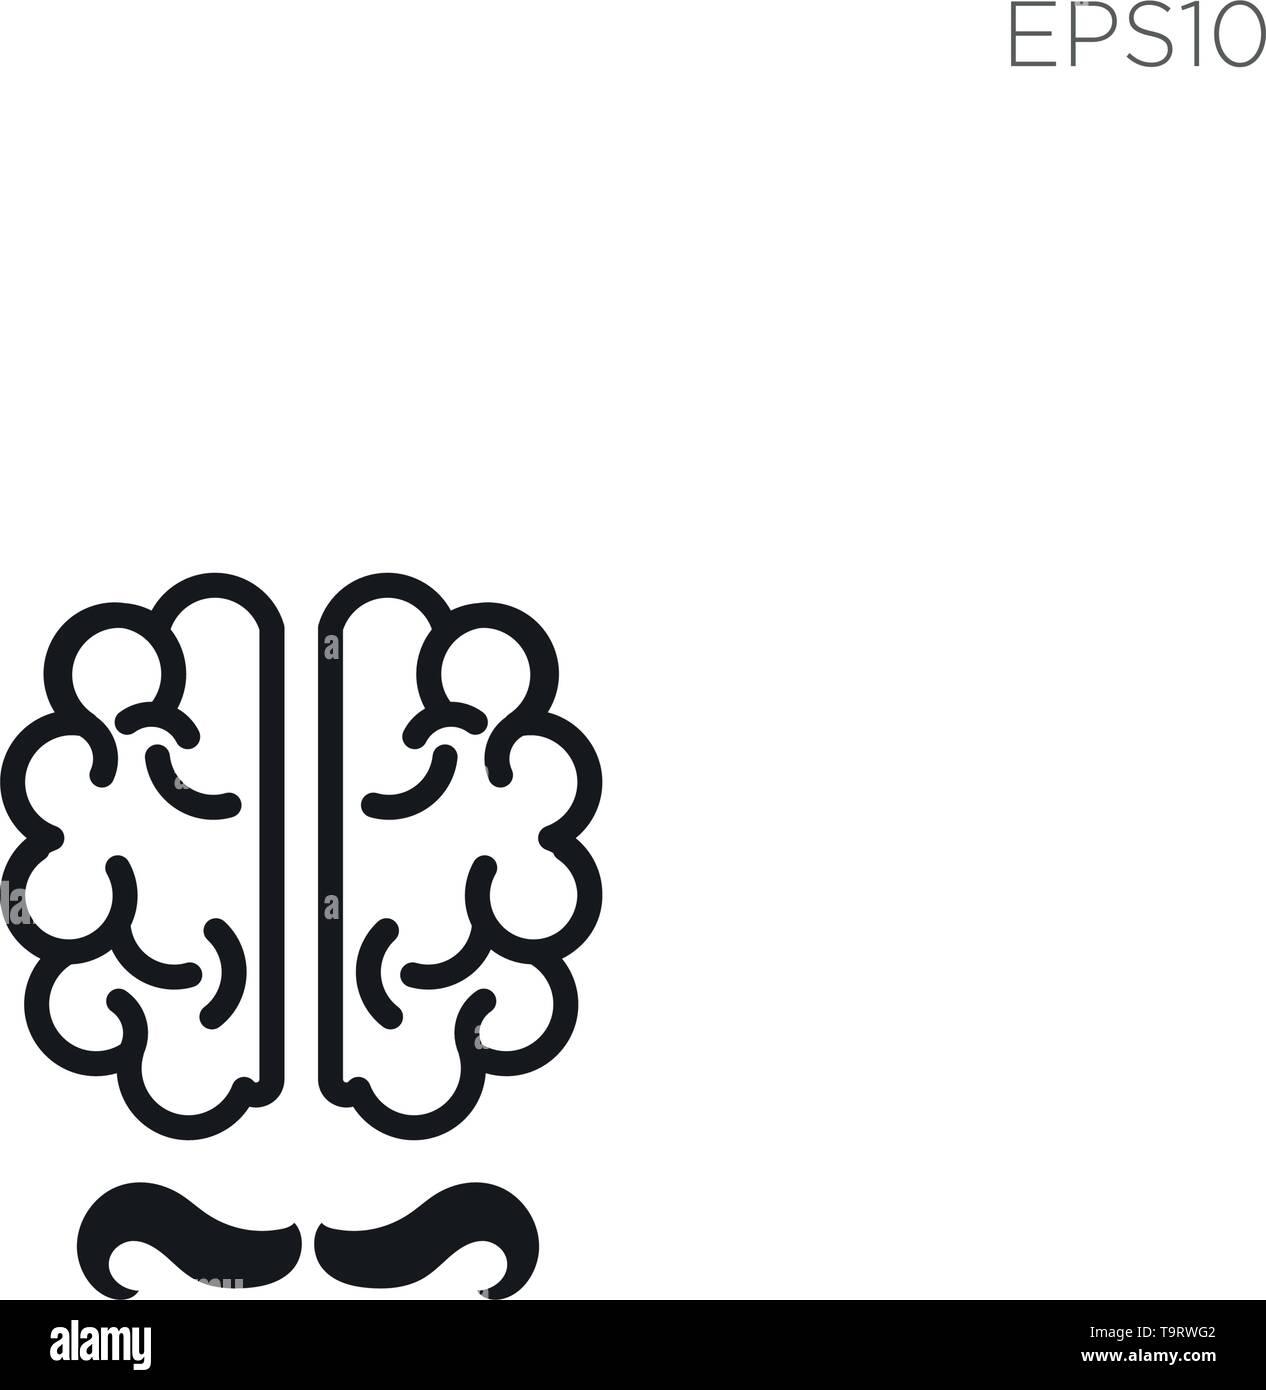 brain talk idea logo template vector illustration icon element isolated - Stock Image